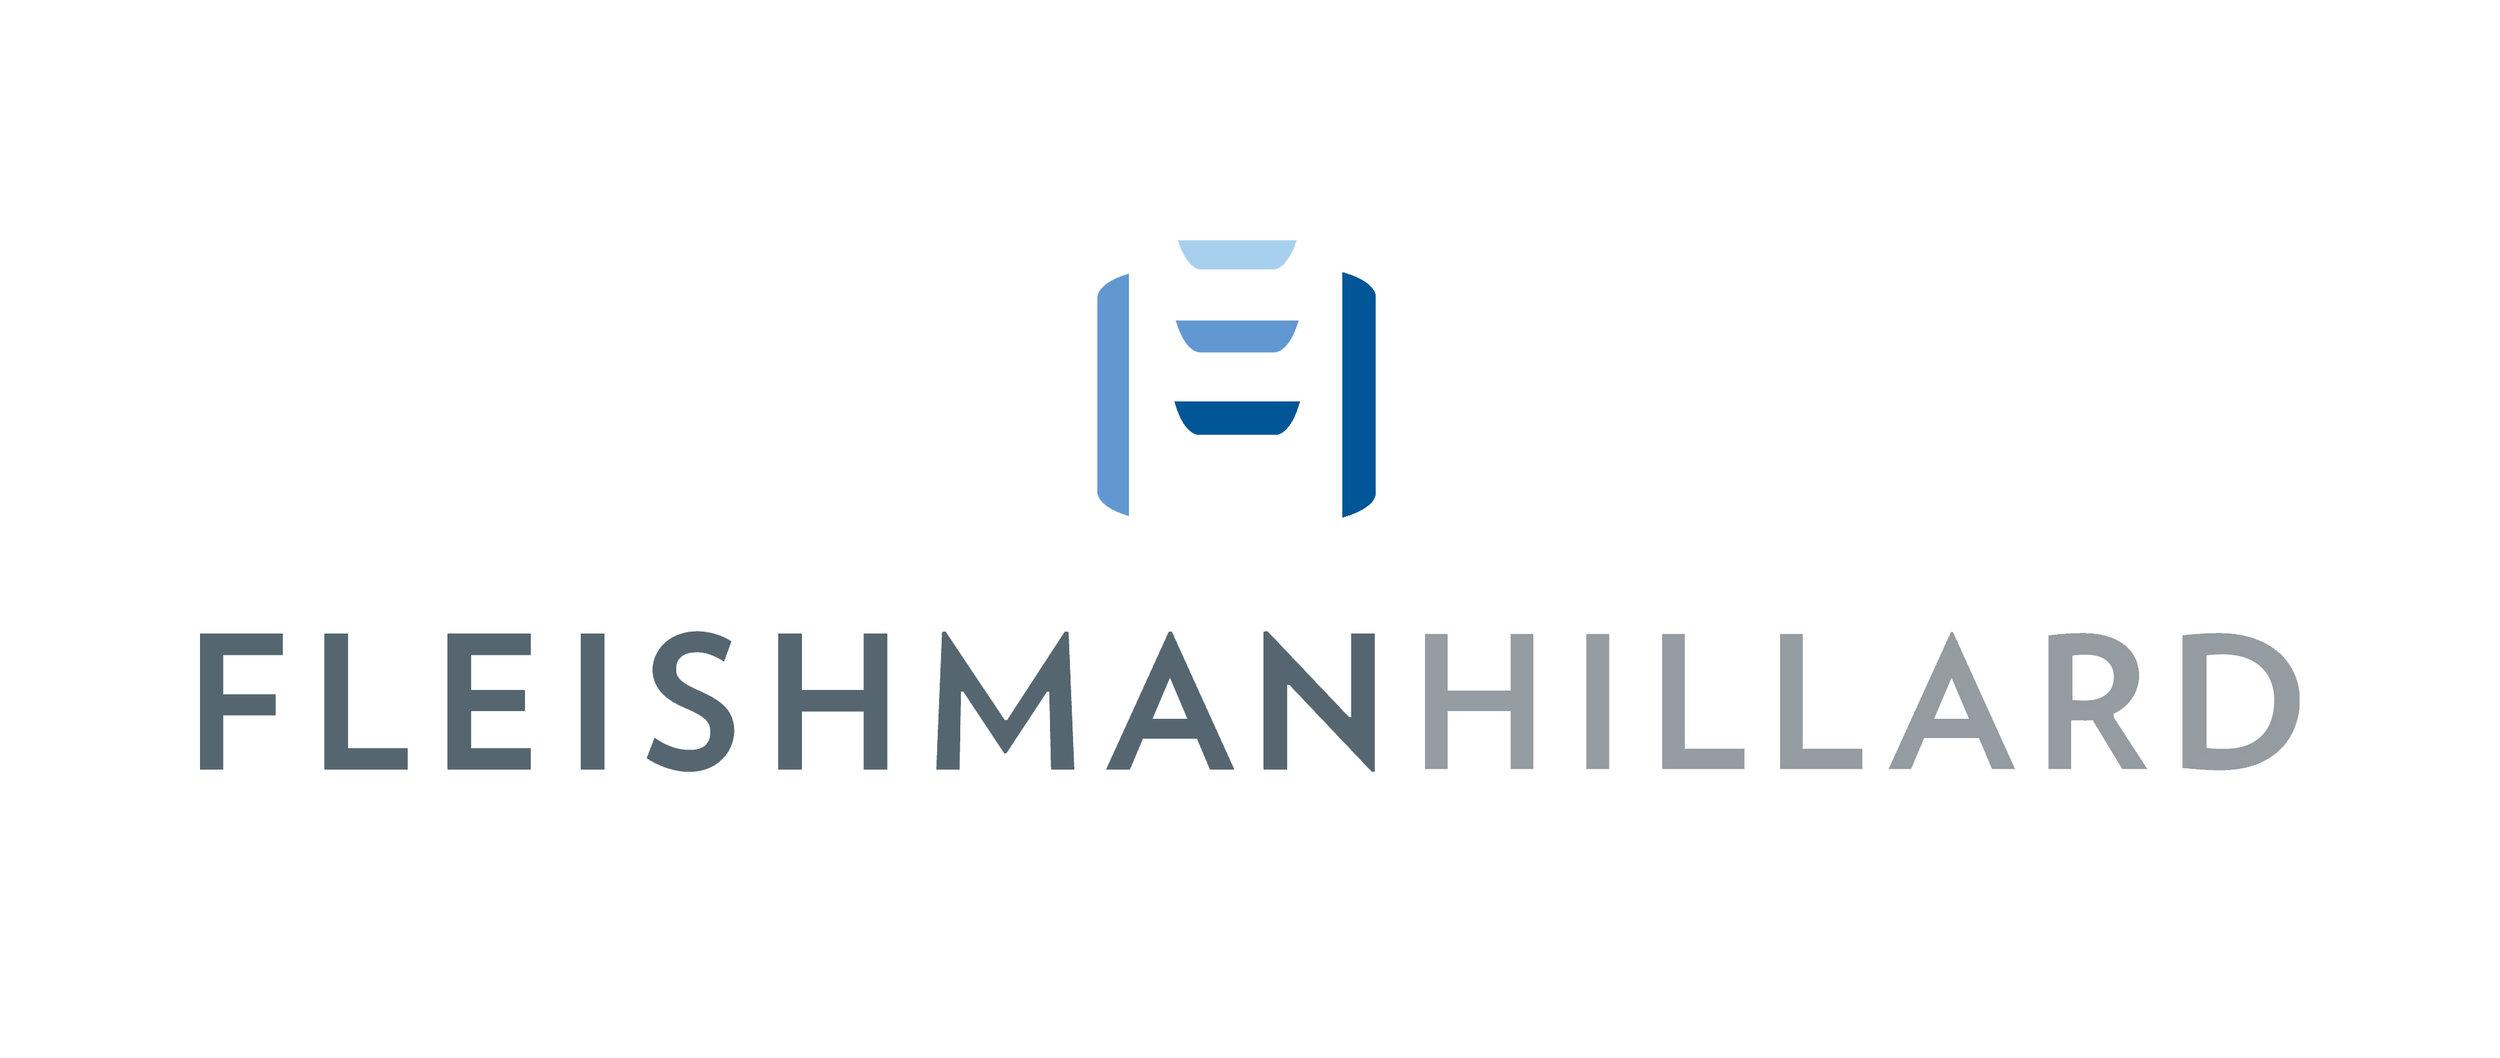 FleishmanHillard_logo_4c.jpg